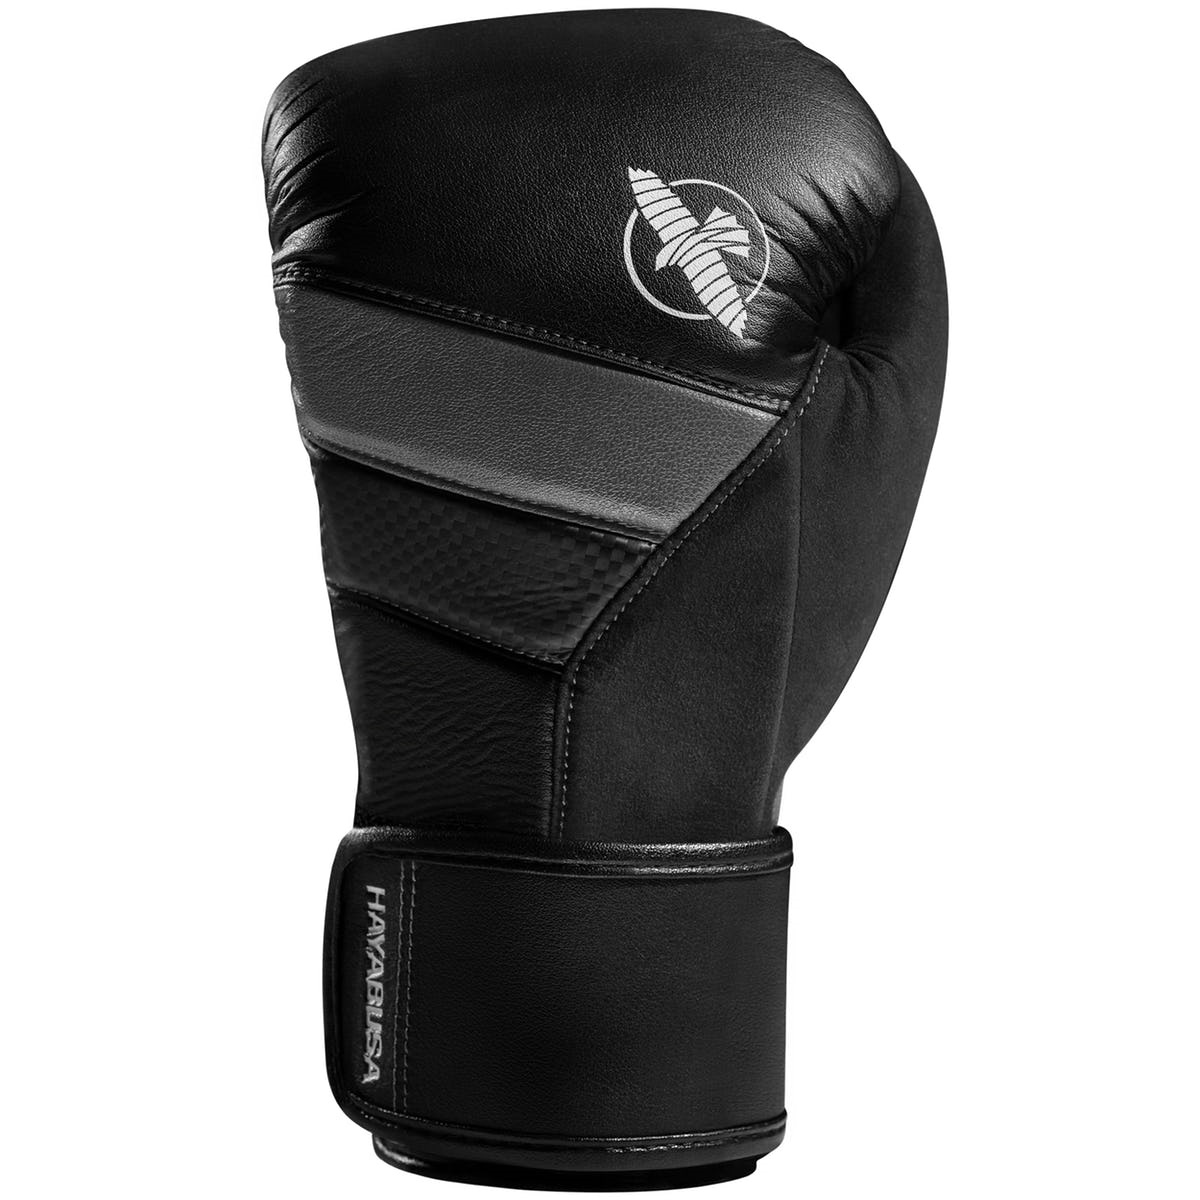 Hayabusa-T3-Dual-X-Hook-and-Loop-Closure-Vylar-Leather-Training-Boxing-Gloves thumbnail 8